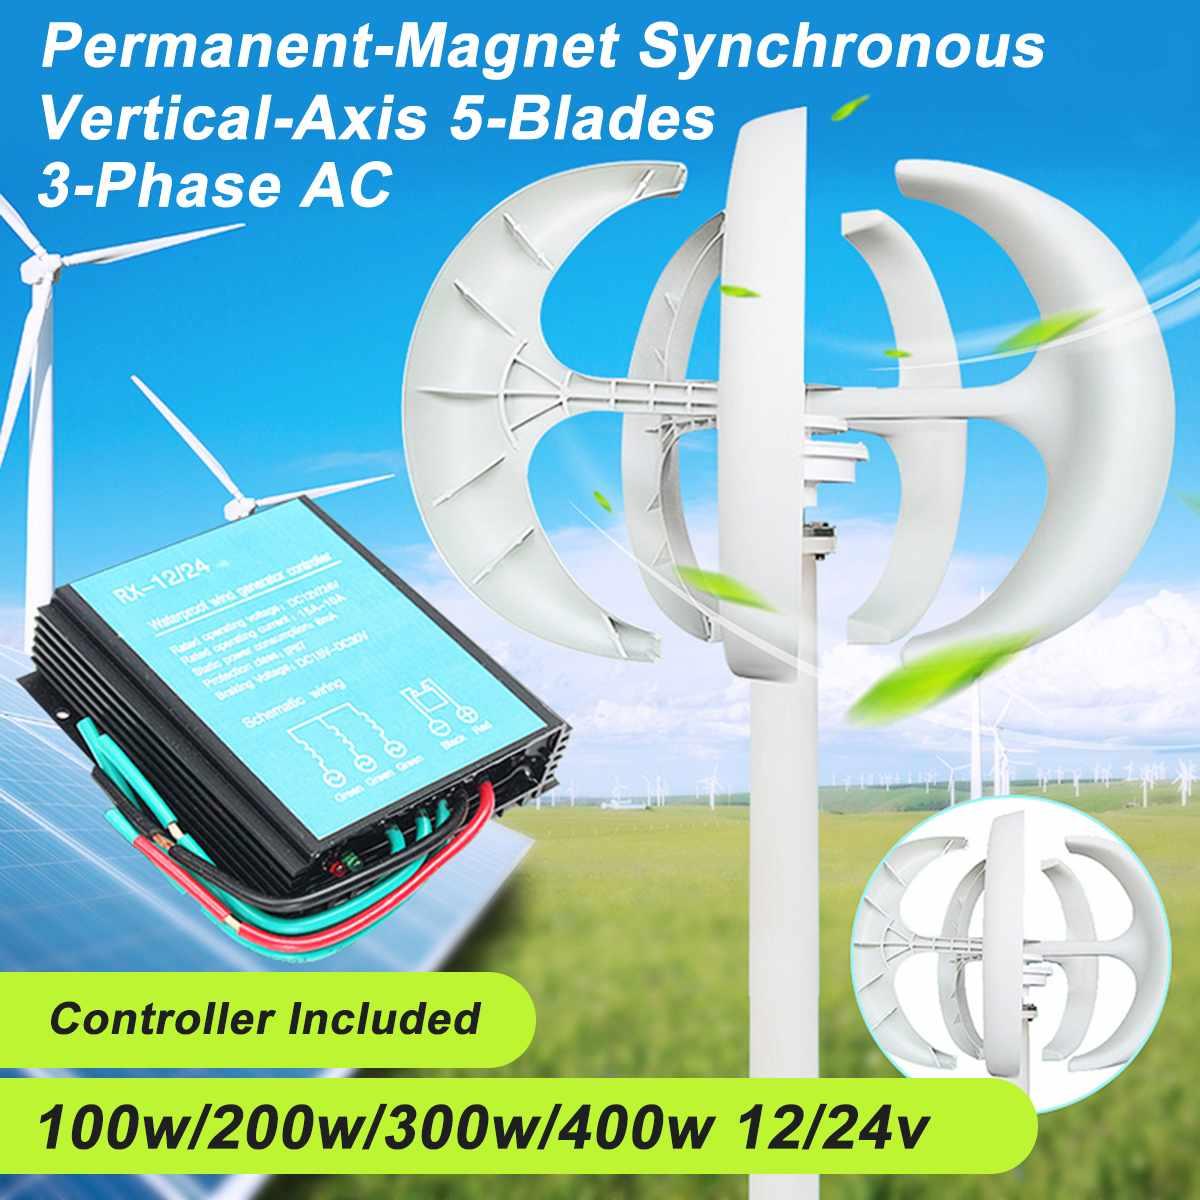 300W 12V Vertical Axis Wind Generator VAWT Barco Jardim com Controlador 5-Lâminas 3-Fase AC-Ímã Permanente Synchronous